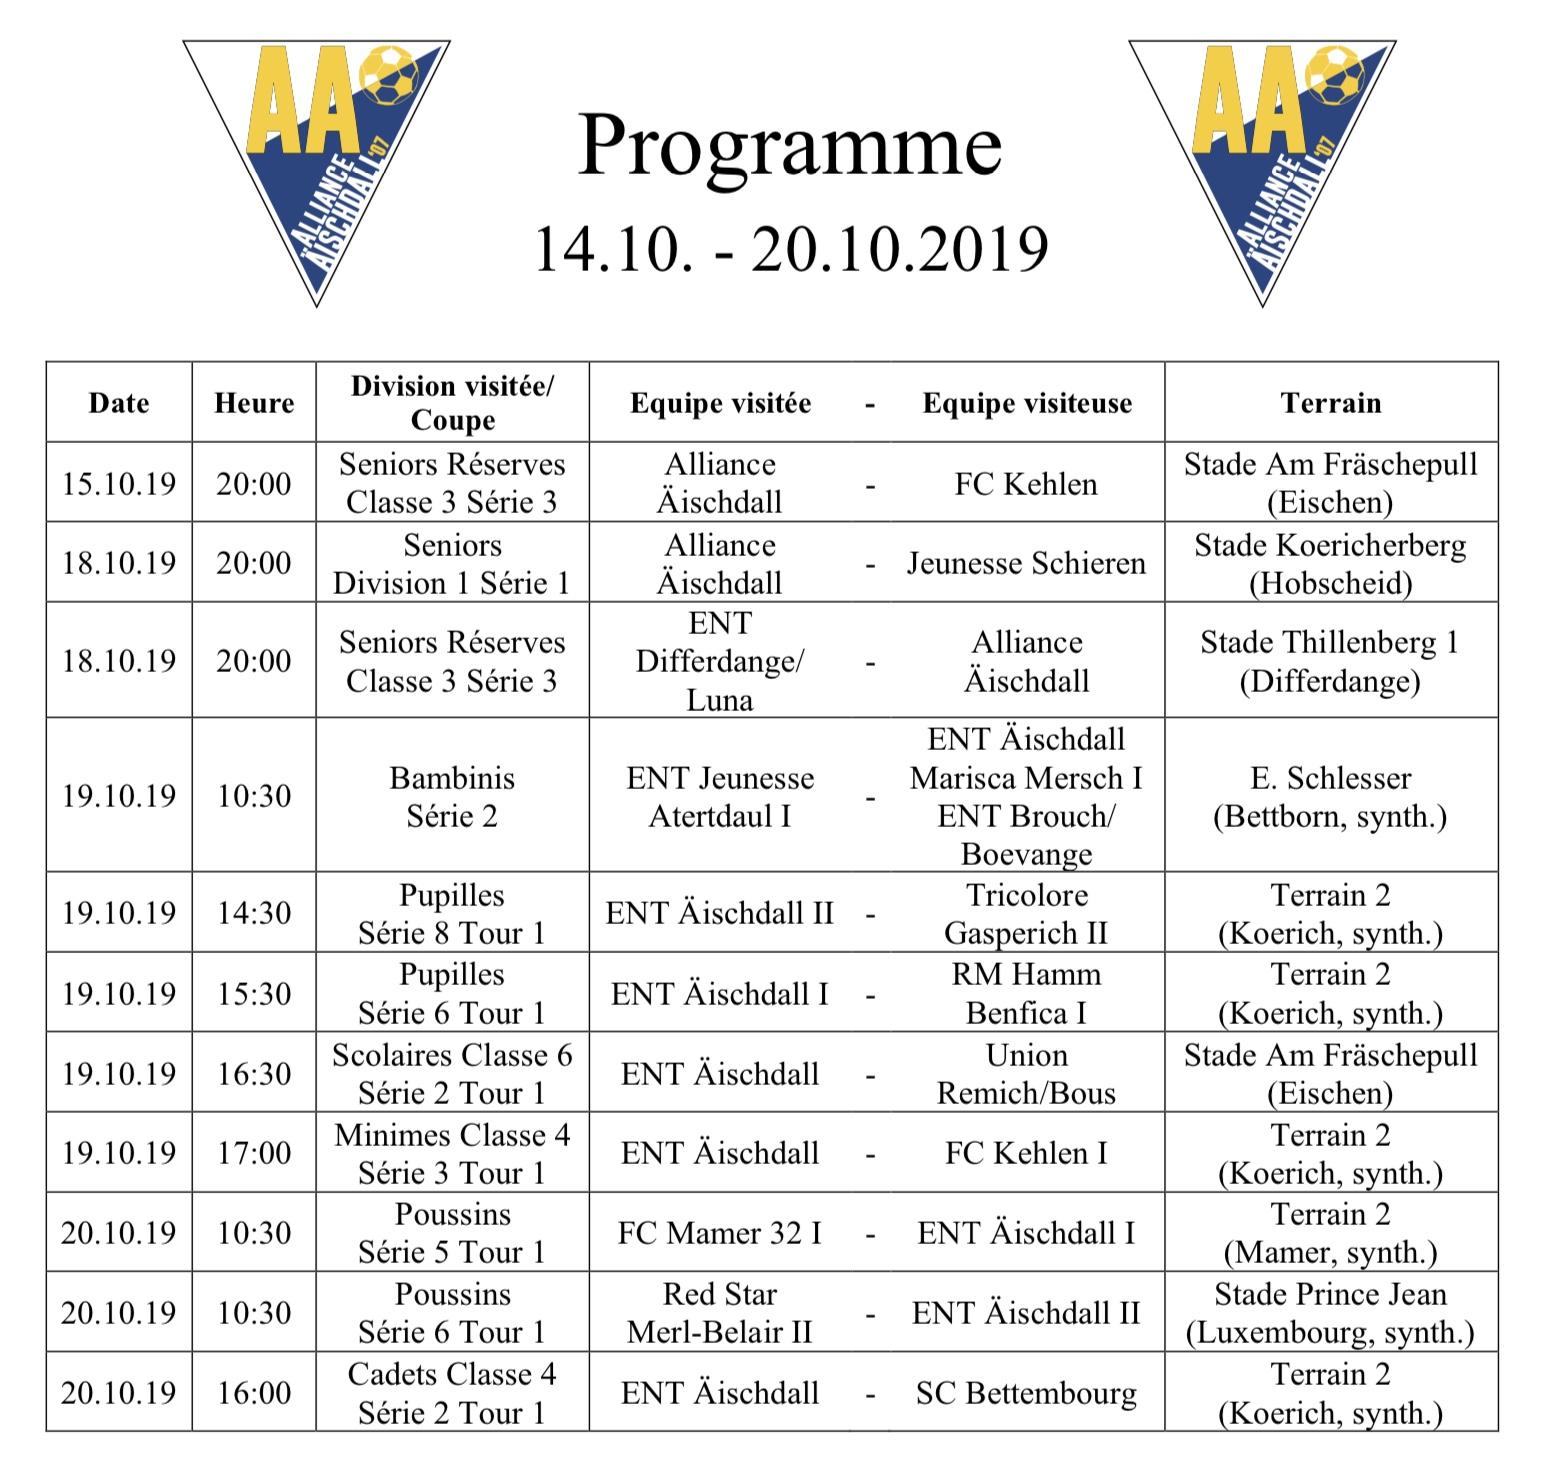 Programm 14.10.-20.10.2019